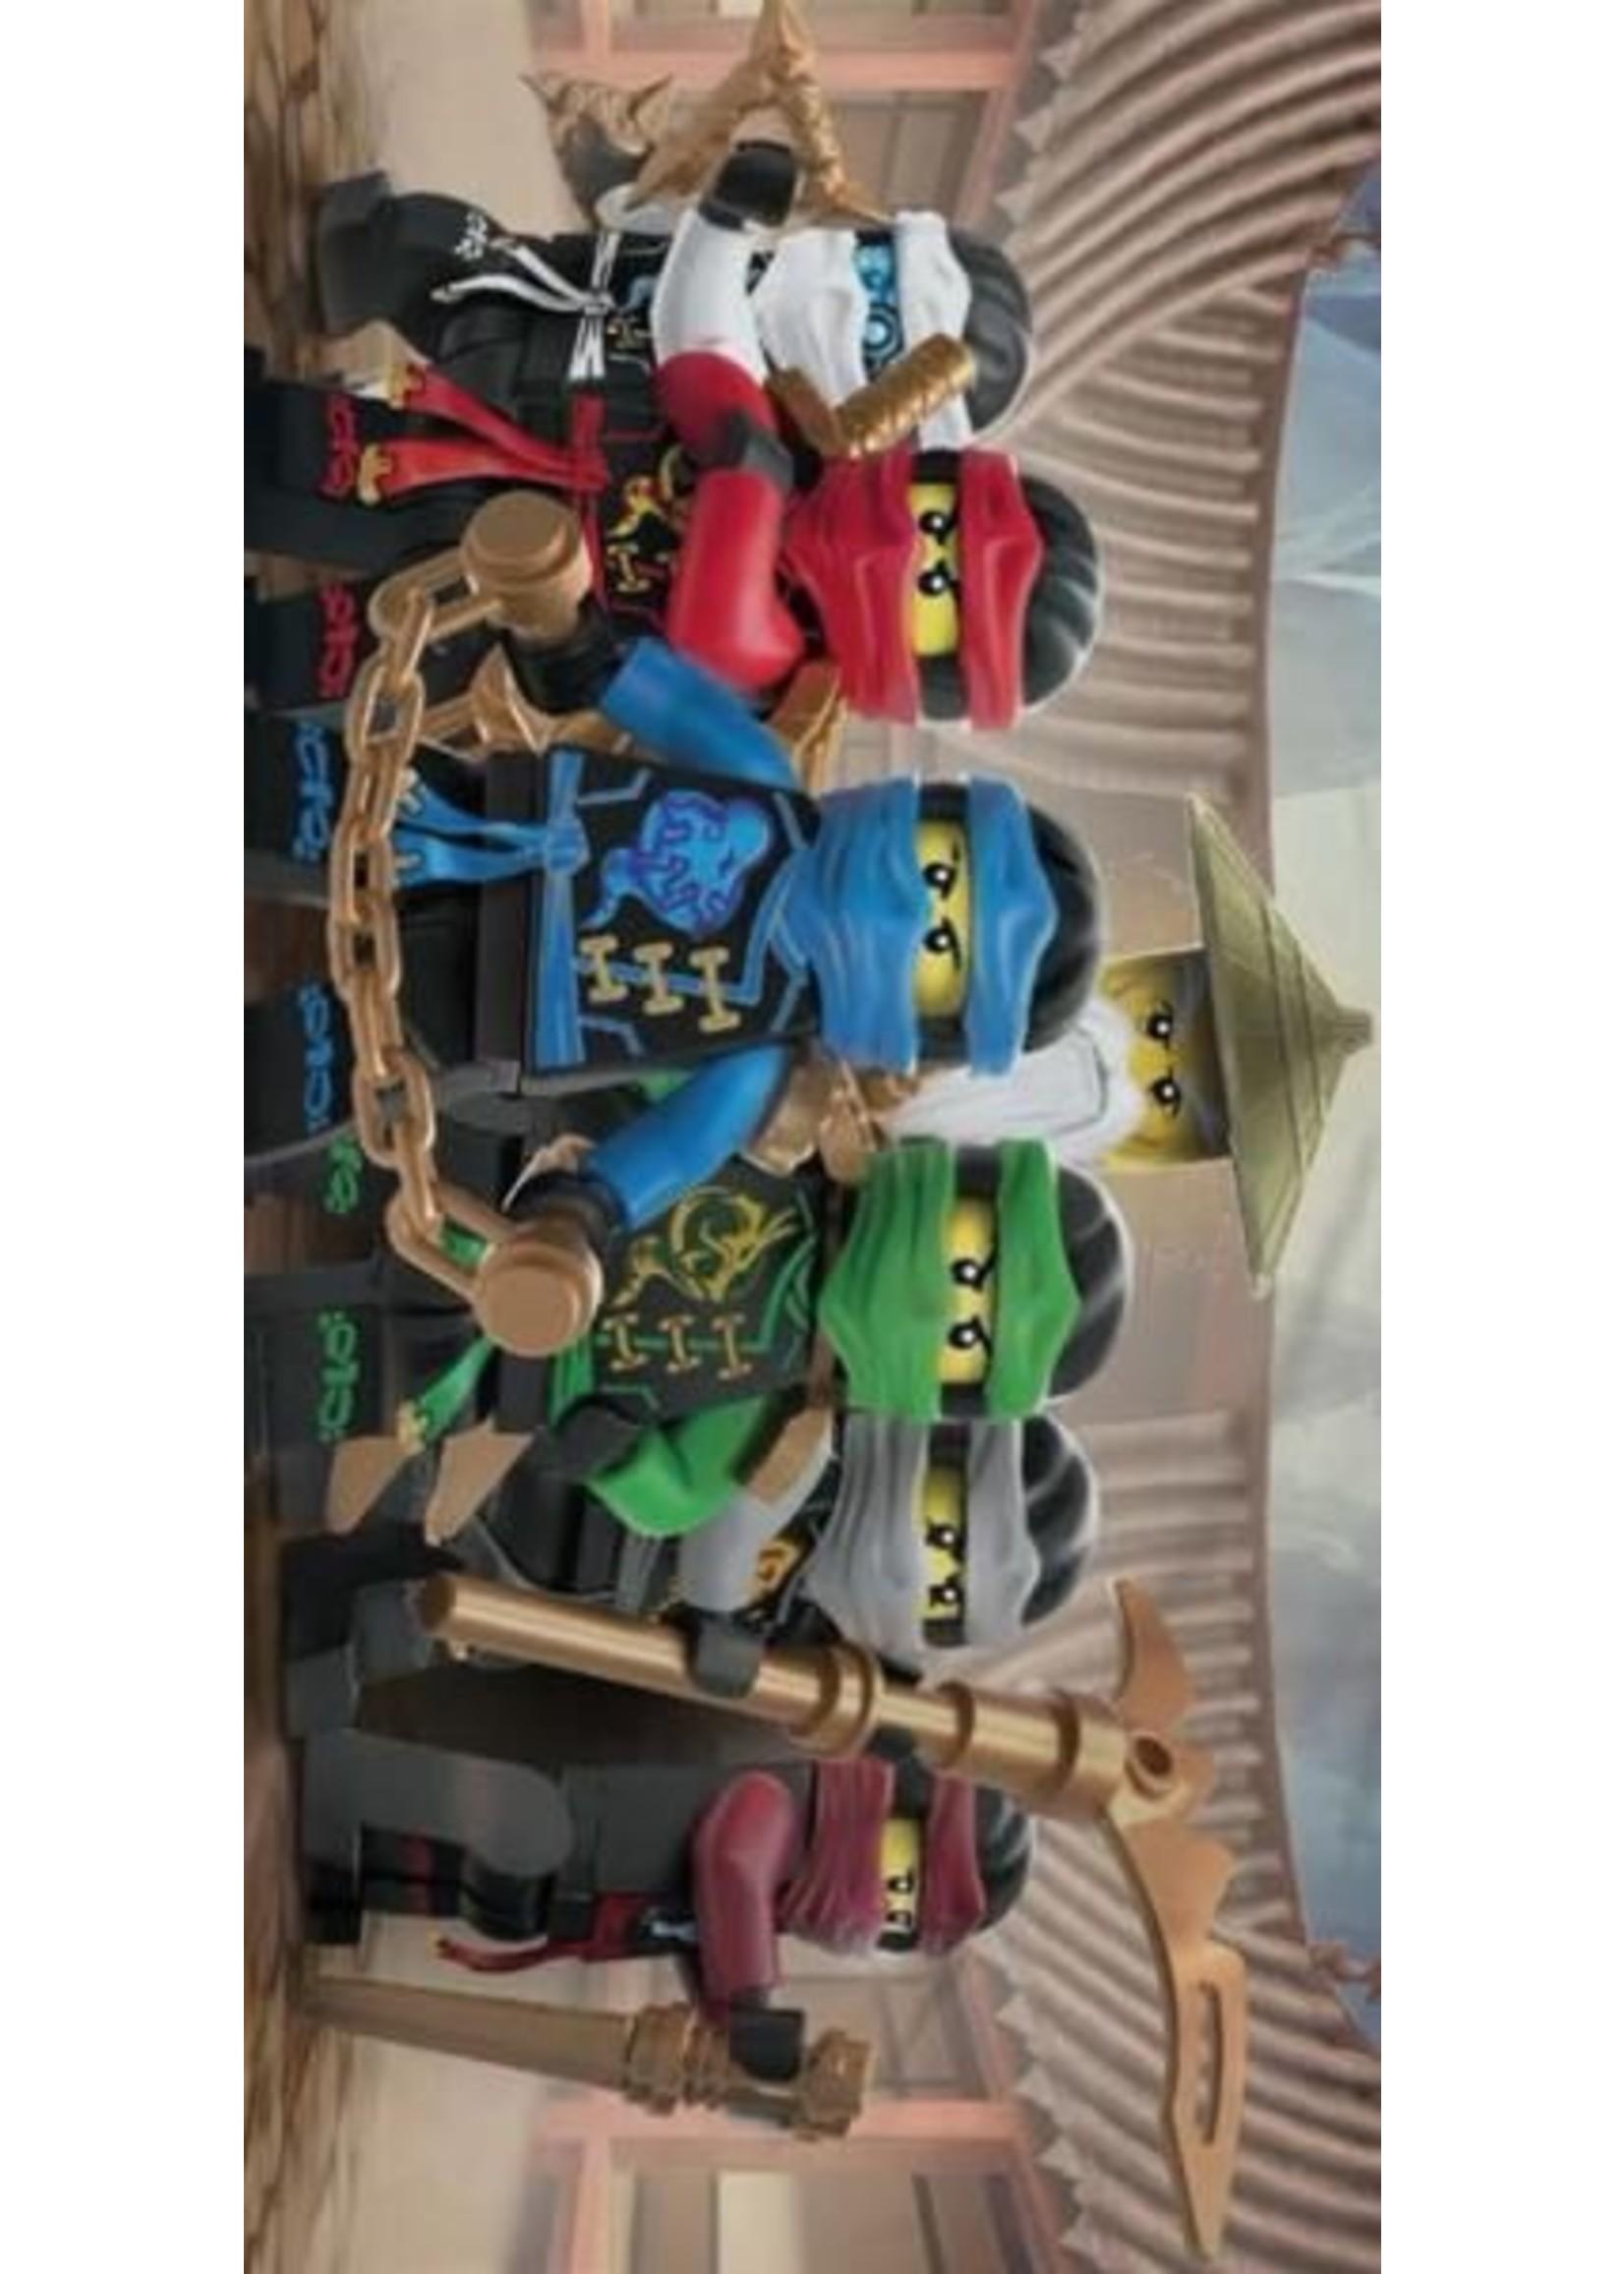 Lego Lego Ninjago Badlaken Guru